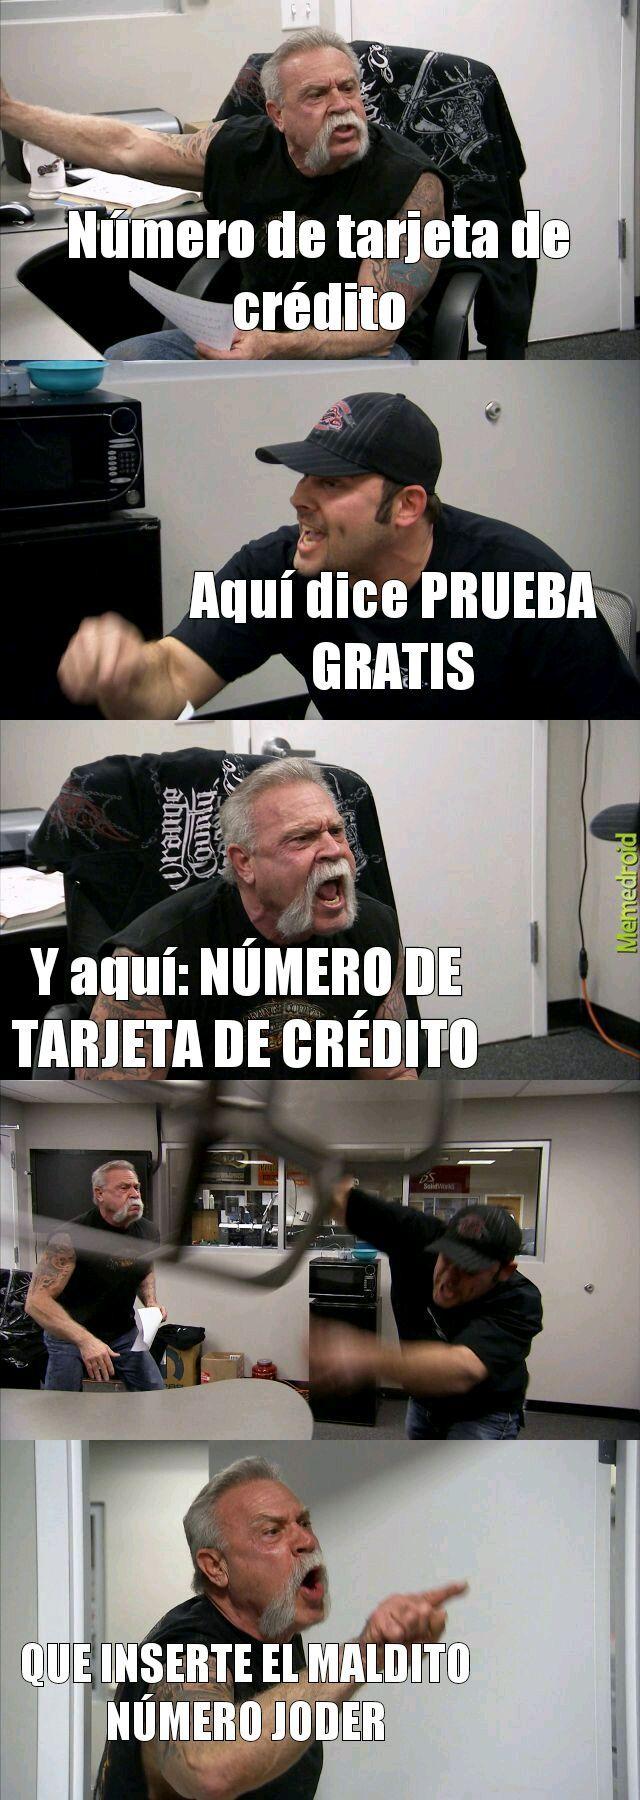 Número de tarjeta de crédito - meme